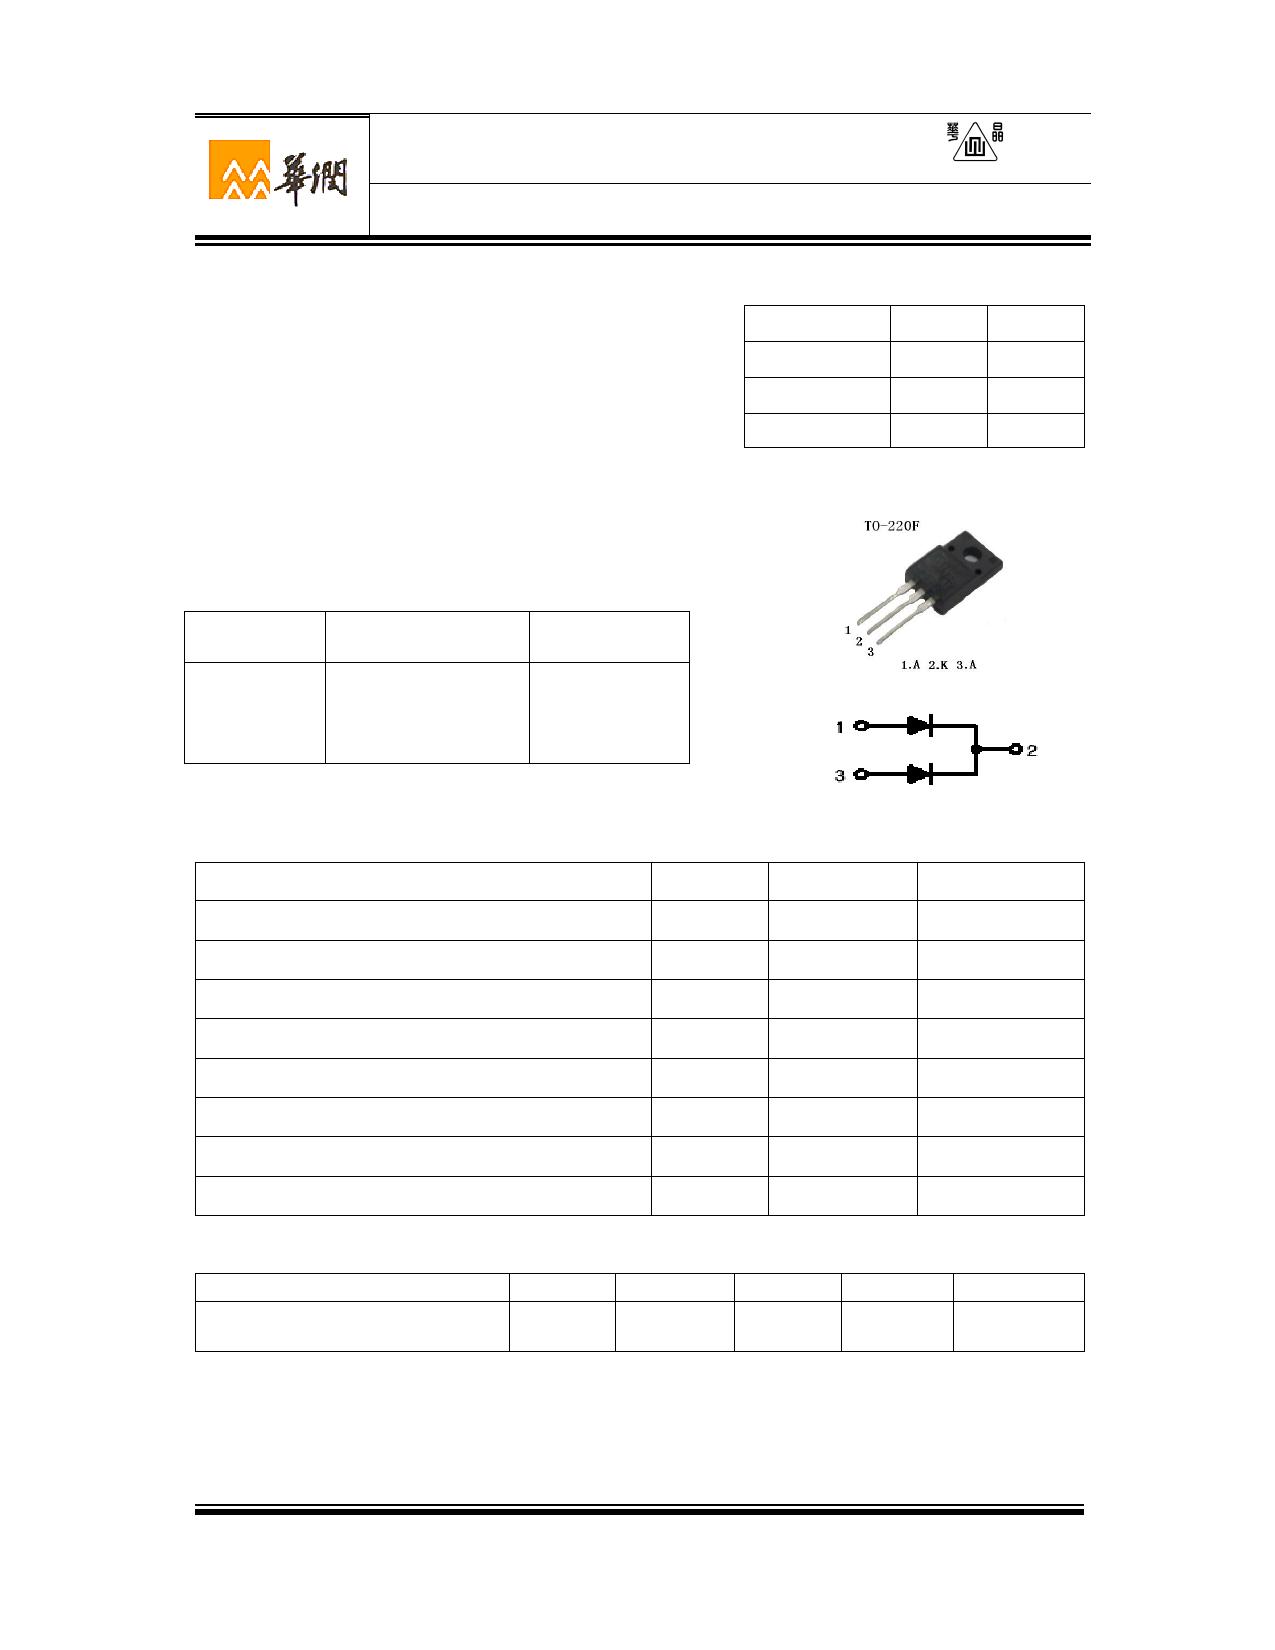 2CZ2545A9 Datasheet, 2CZ2545A9 PDF,ピン配置, 機能